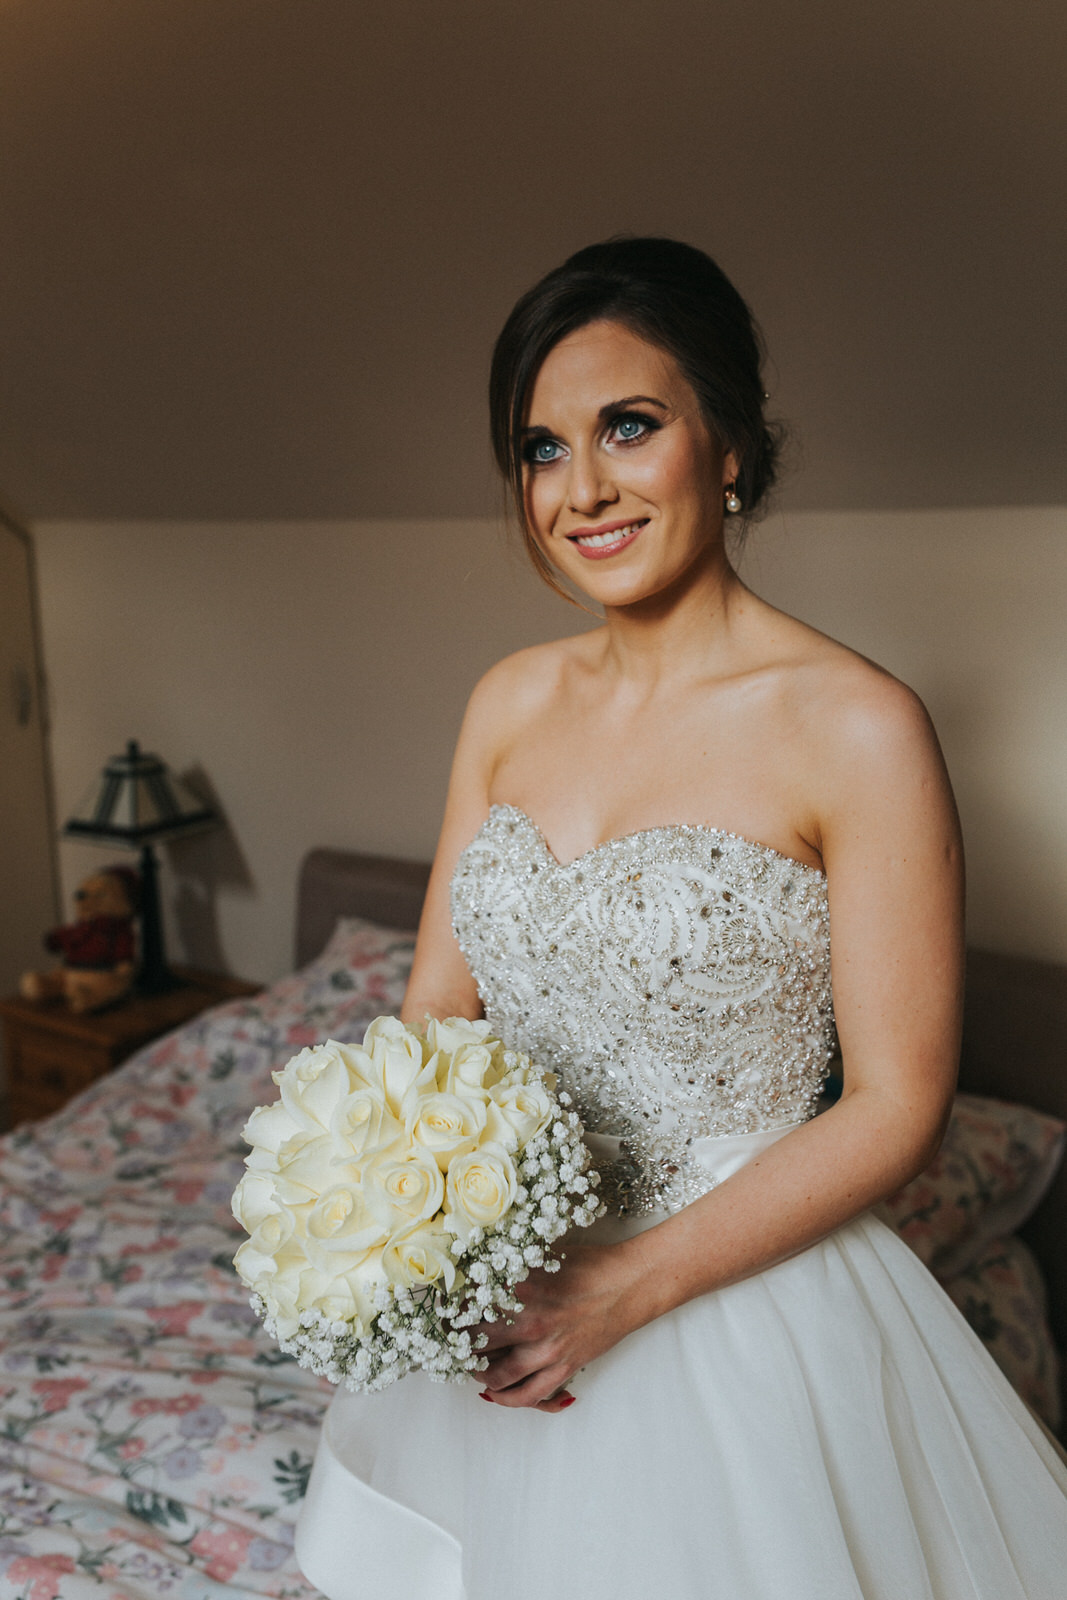 Clonabreany_wedding-photographer_roger_kenny_ireland_021.jpg